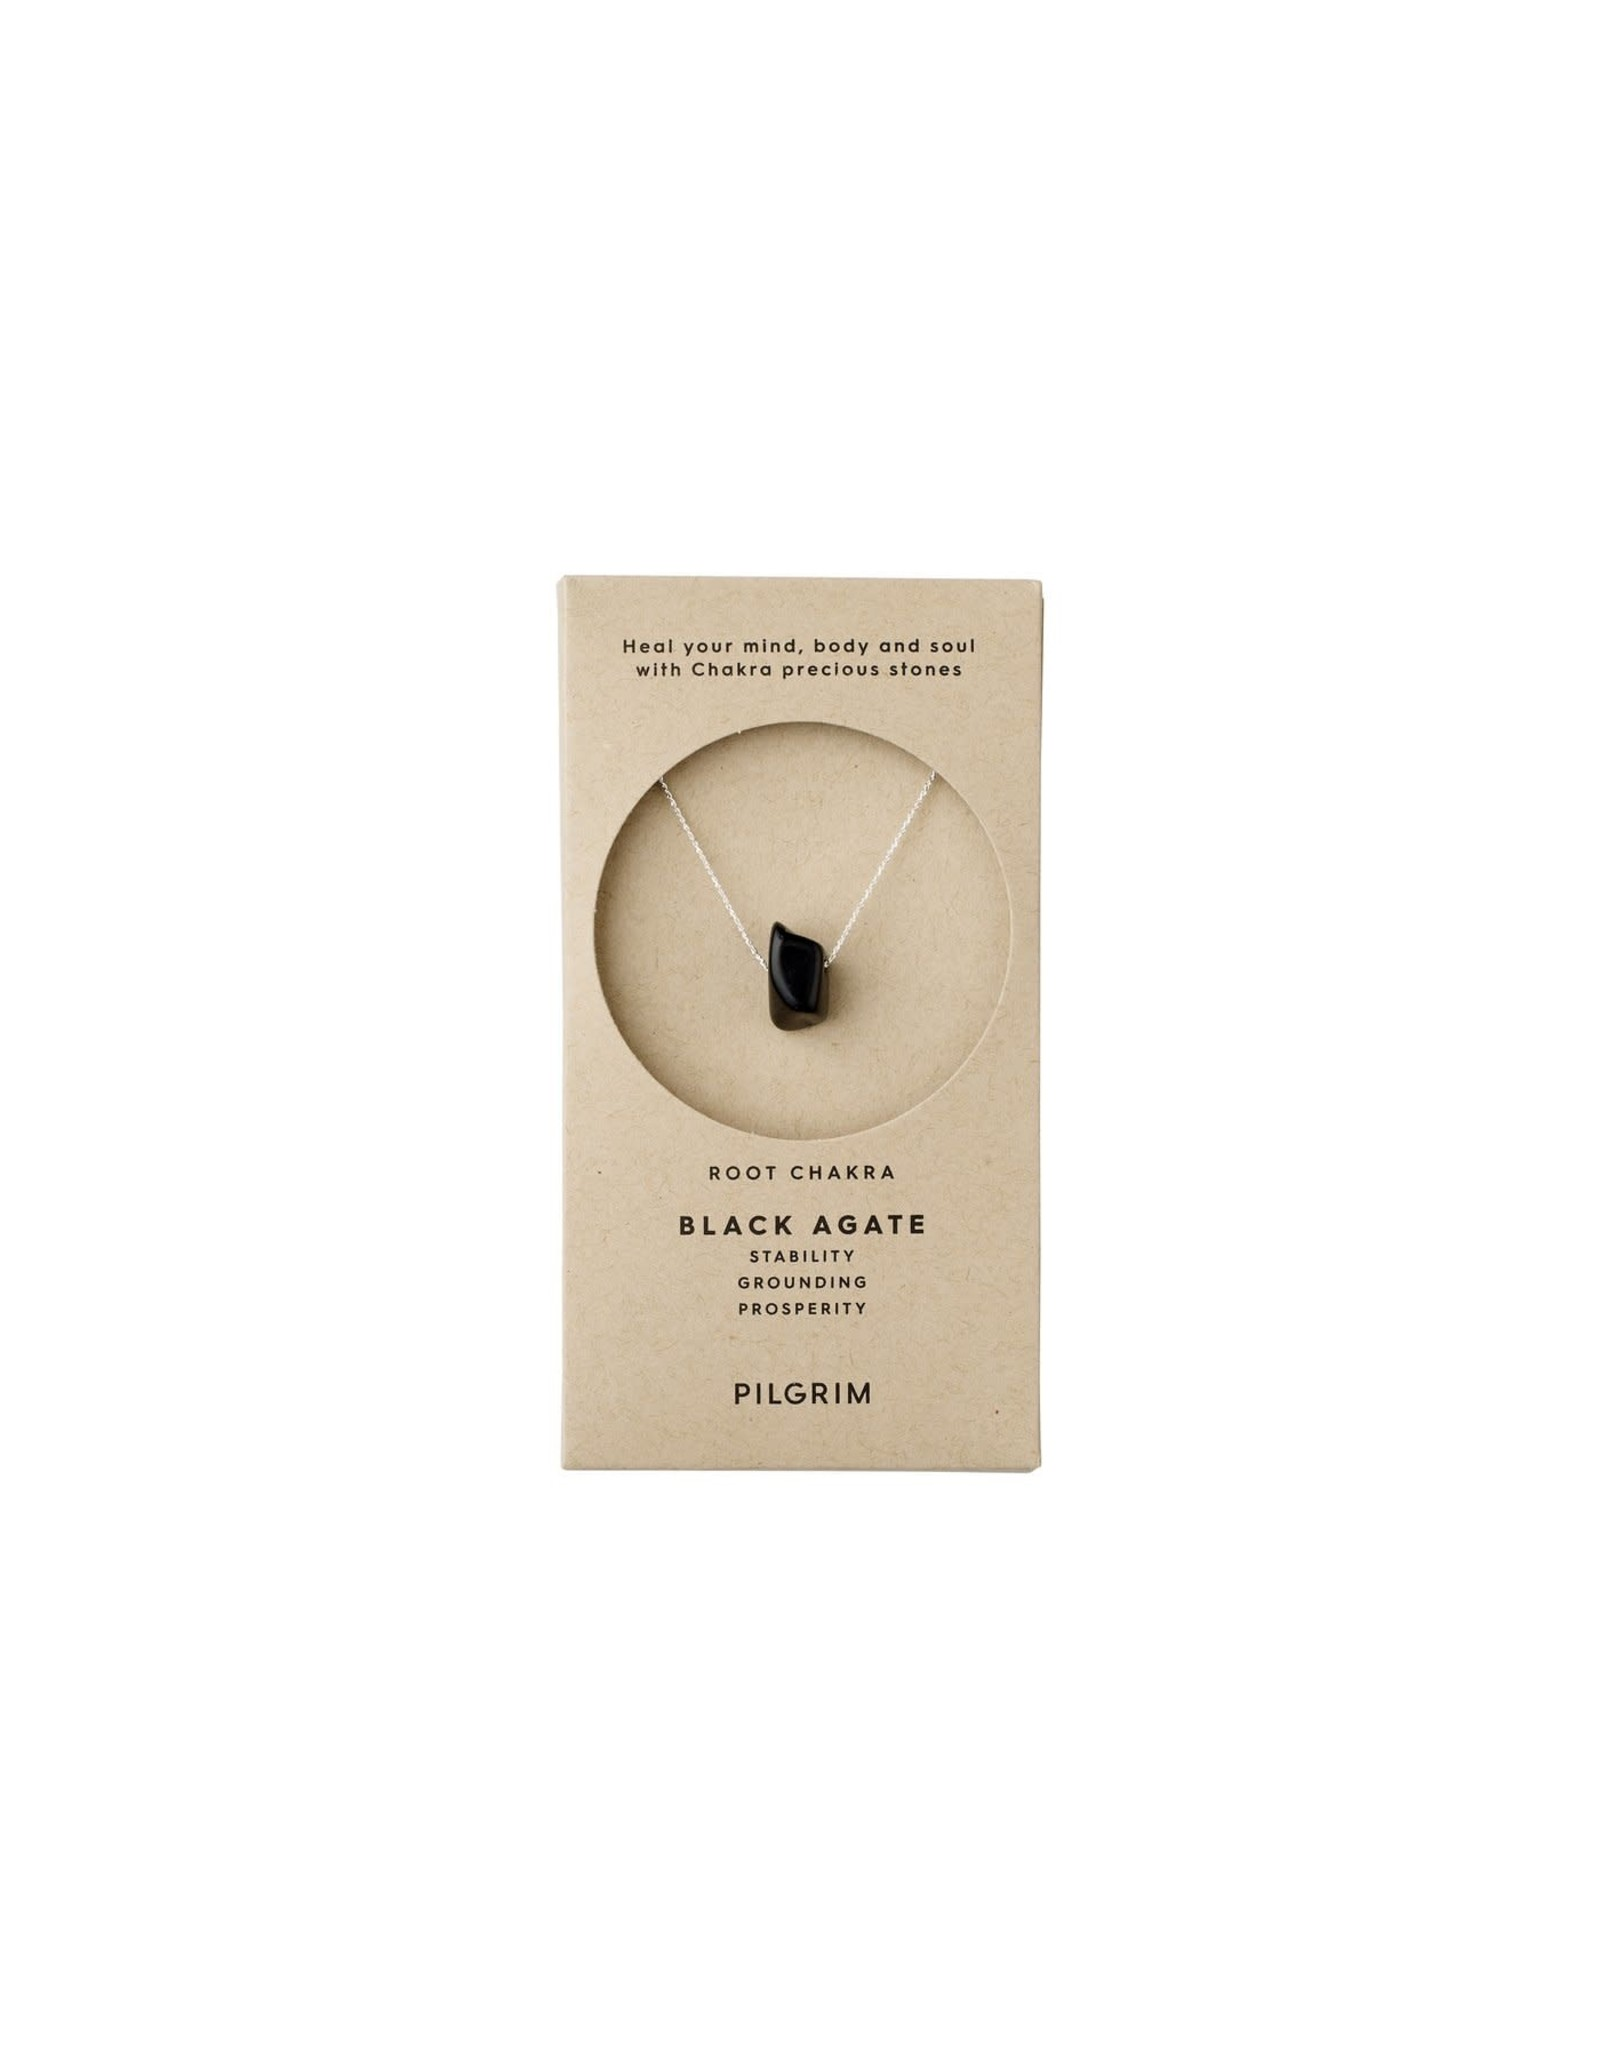 Pilgrim Pilgrim Necklace - Root Chakra - Silver Plated - Black Agate